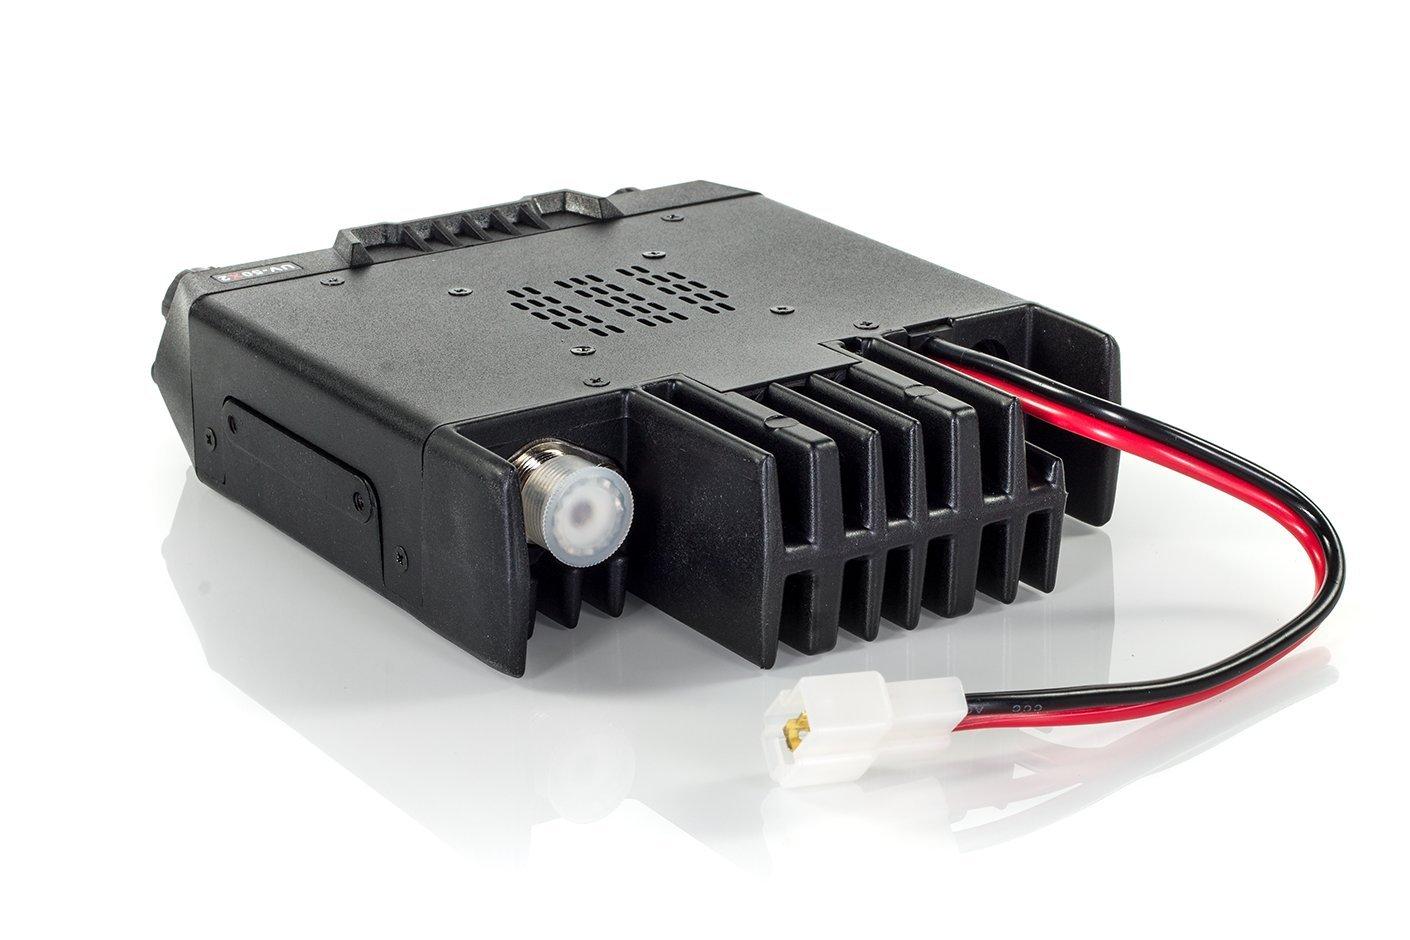 BTECH MOBILE UV-50X2 50 Watt Dual Band Base, Mobile Radio: 136-174mhz (VHF) 400-520mhz (UHF) Amateur (Ham) by BTECH (Image #3)